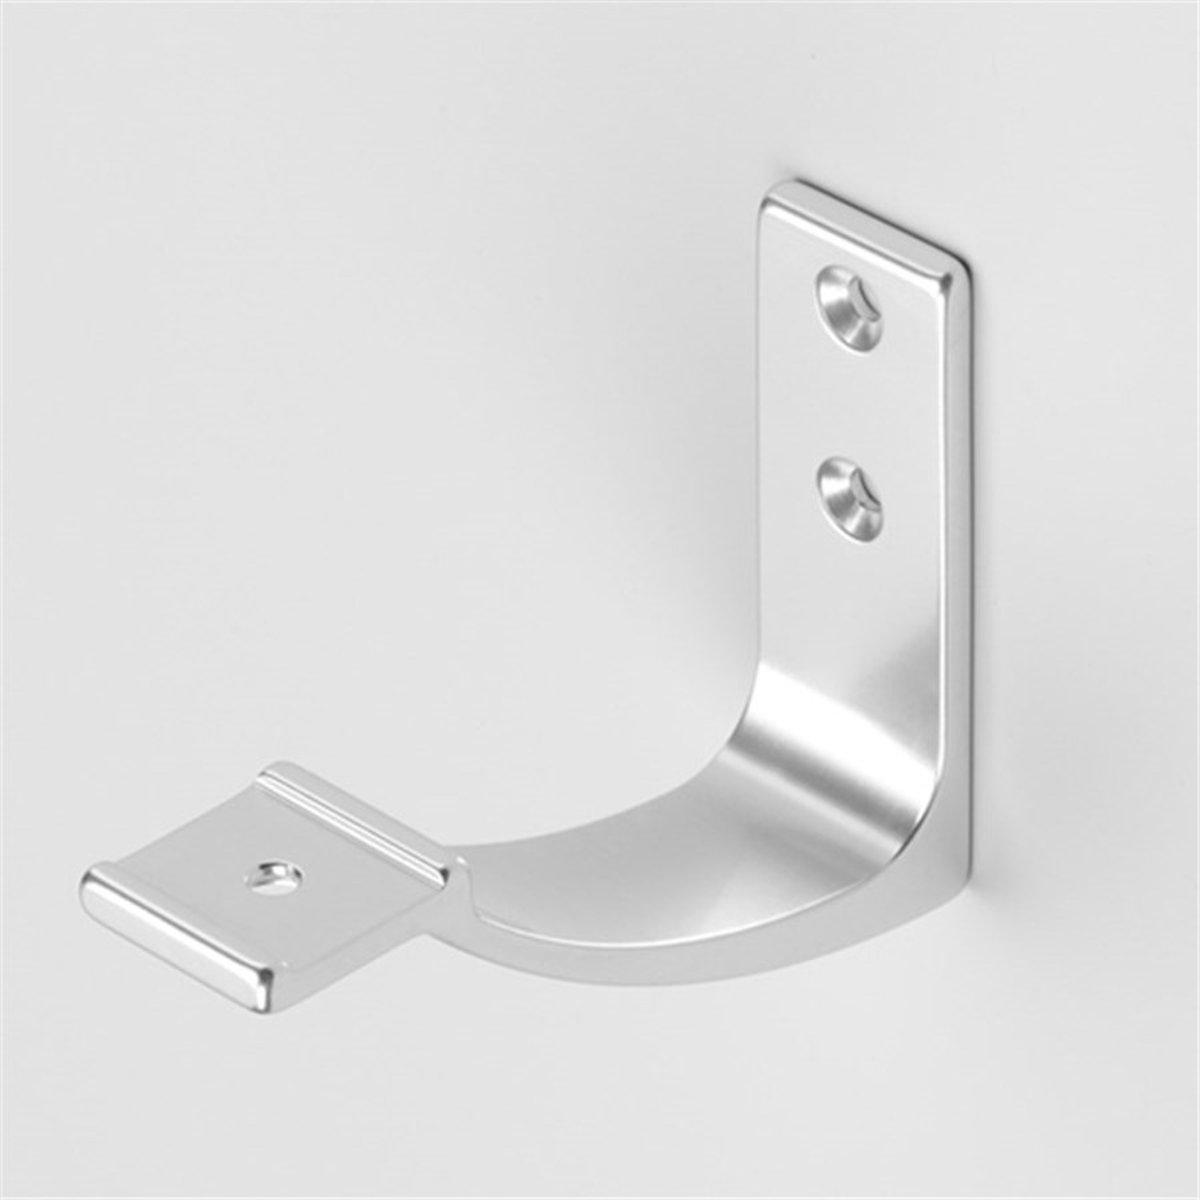 Hermeta leuninghouder - aluminium mat - opschroef - 3545-11 kopen